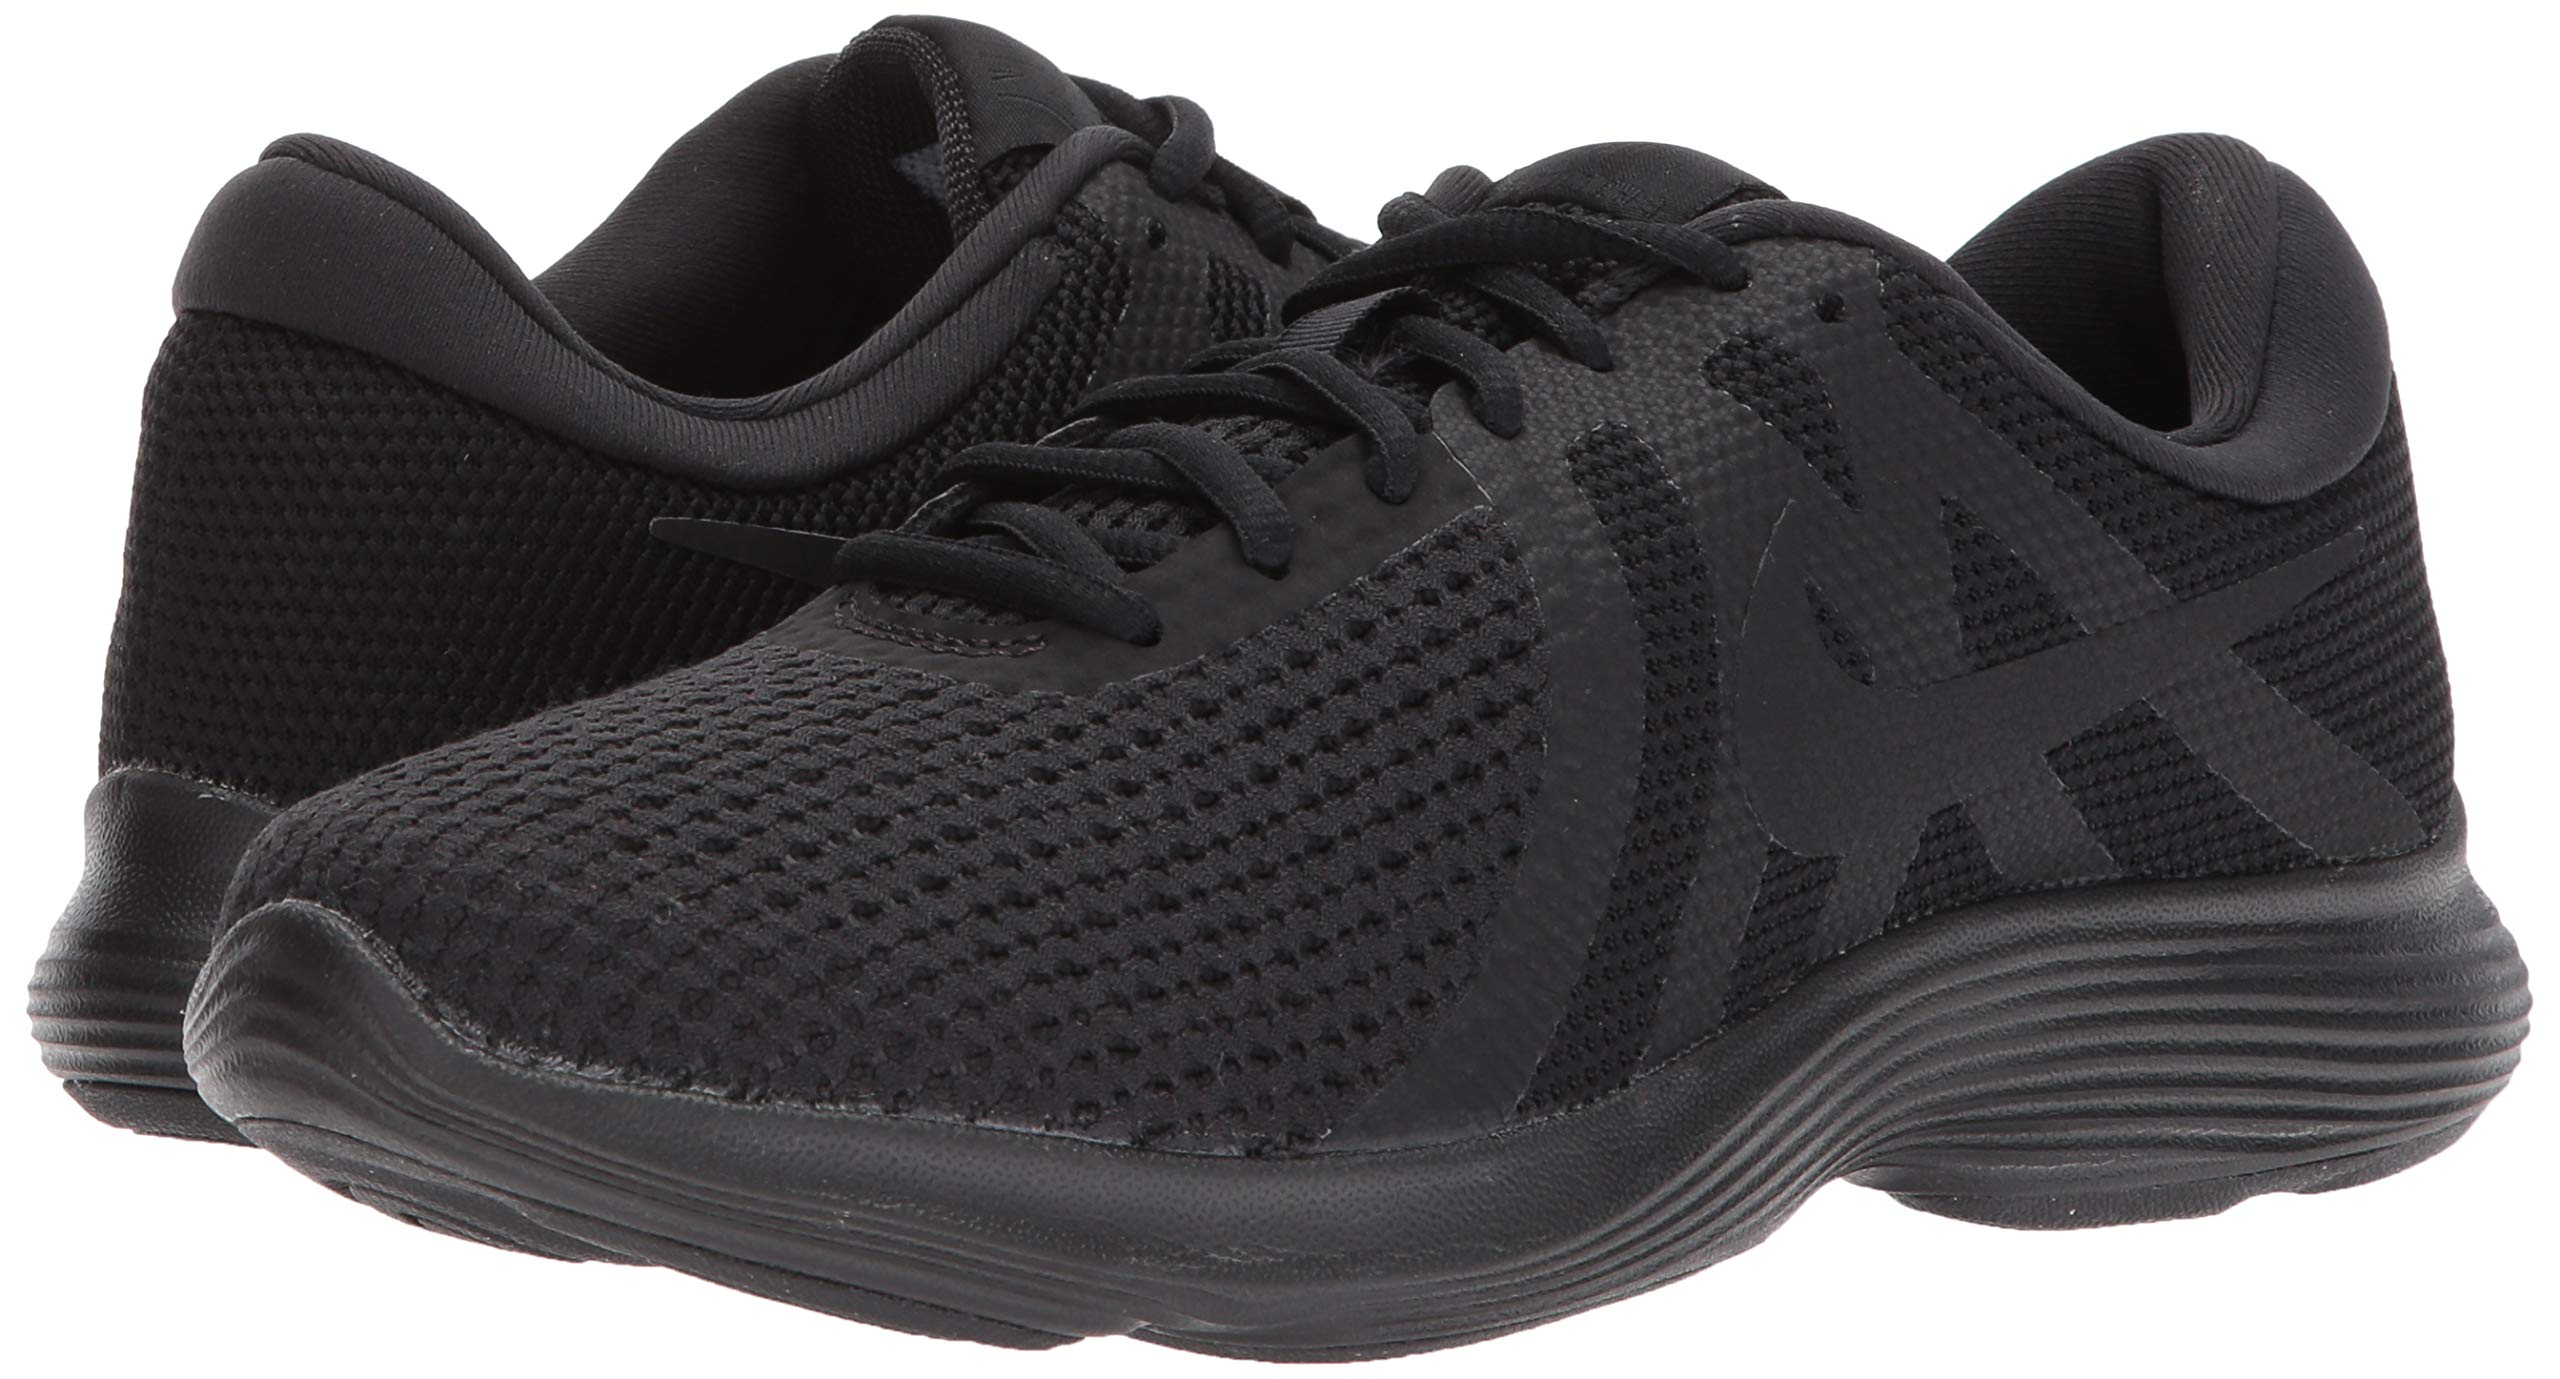 Nike Men's Revolution 4 Running Shoe, Black/White-Anthracite, 7 Regular US by Nike (Image #6)